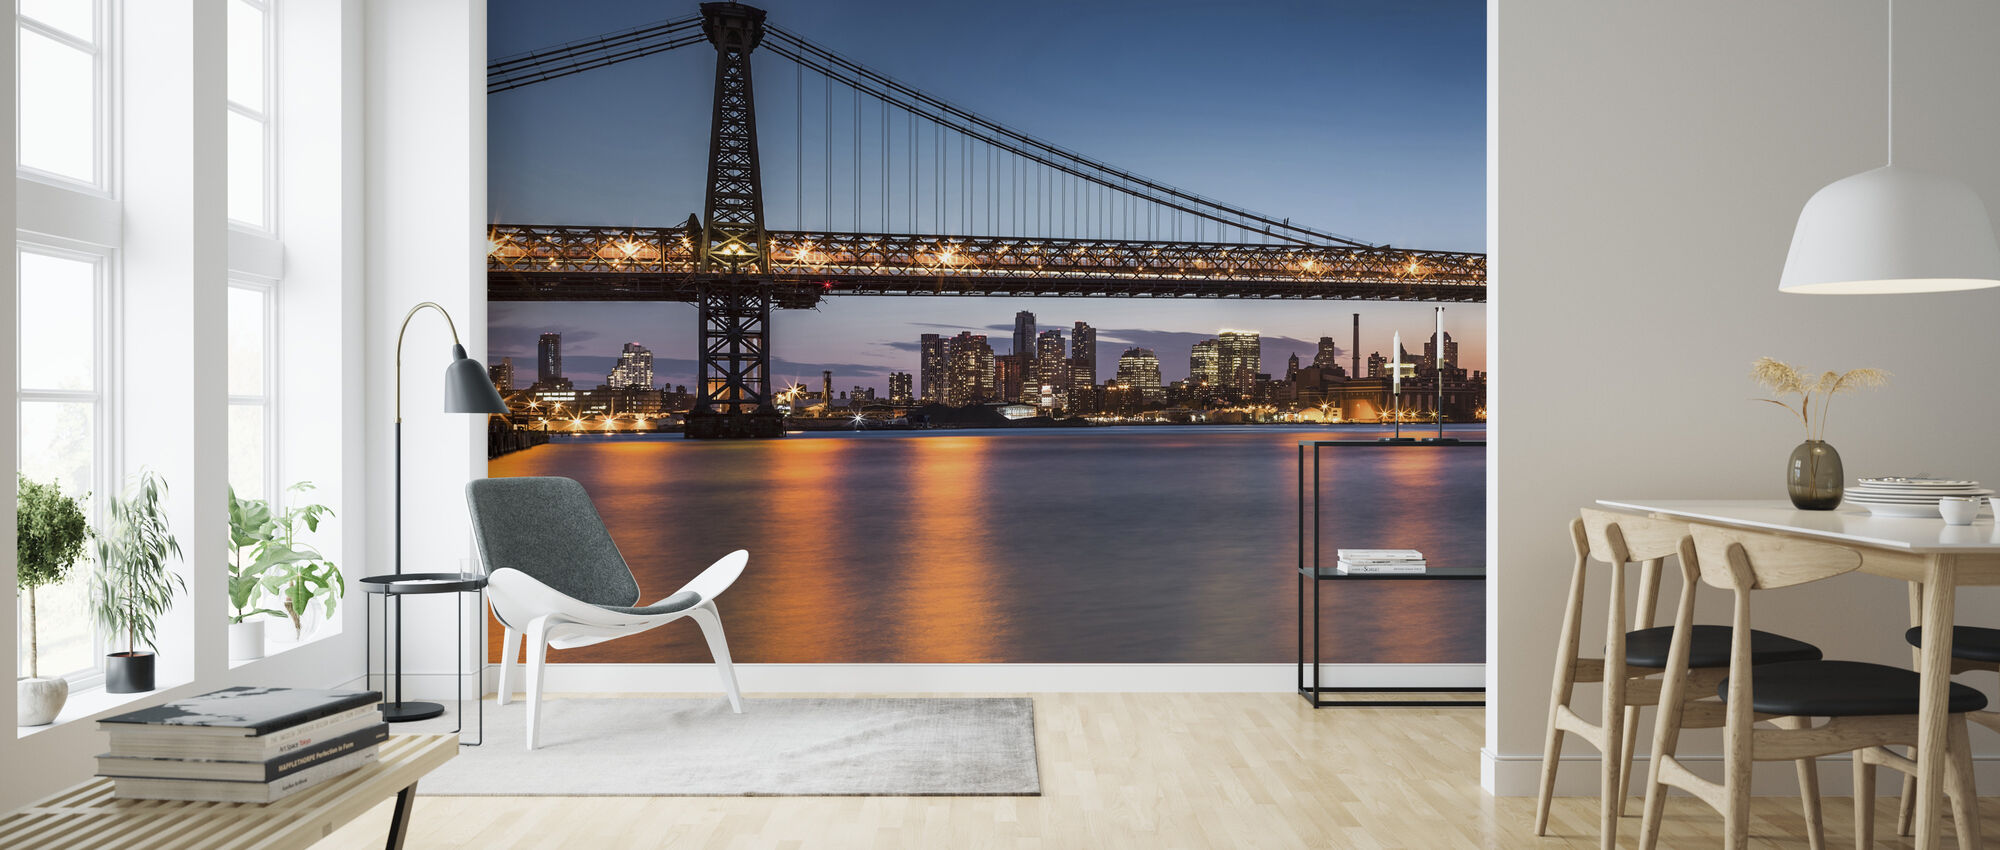 Williamsburg Bridge at Dusk - Wallpaper - Living Room